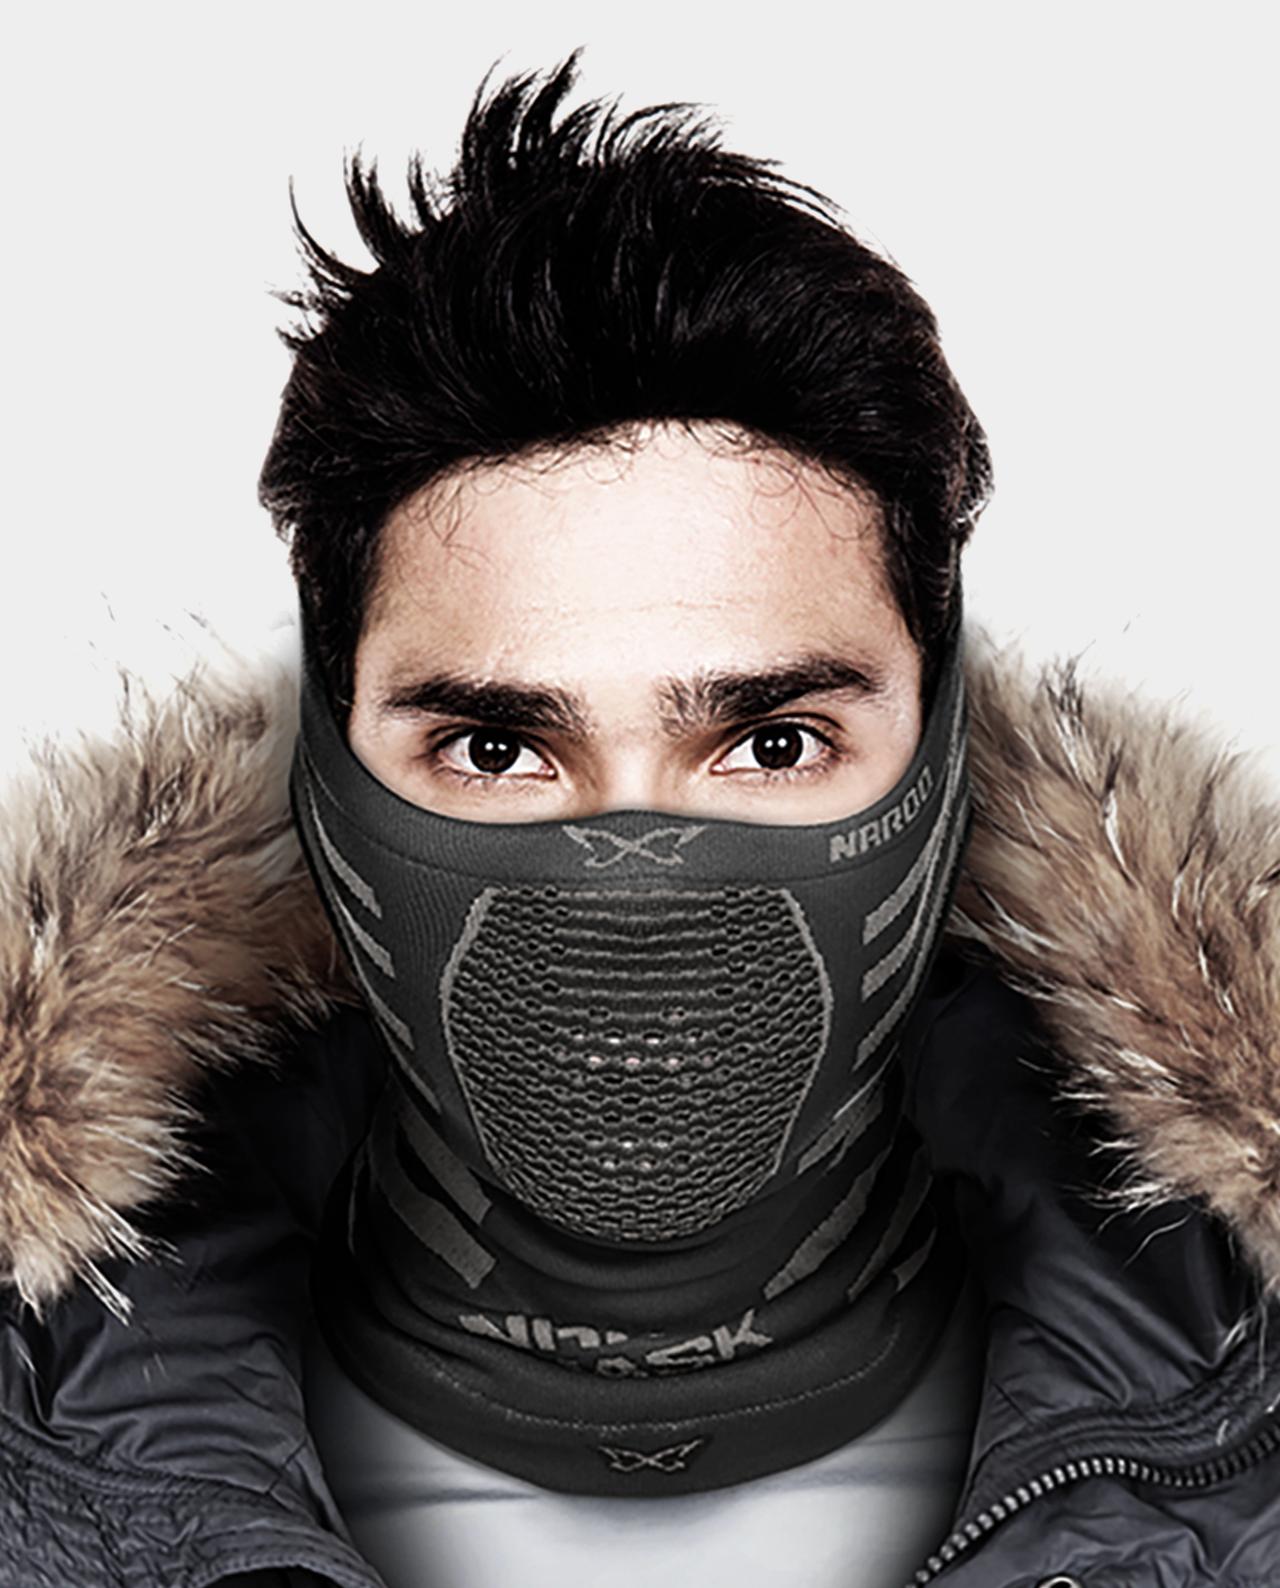 Masca pentru sportivi Naroo Mask X9 imagine